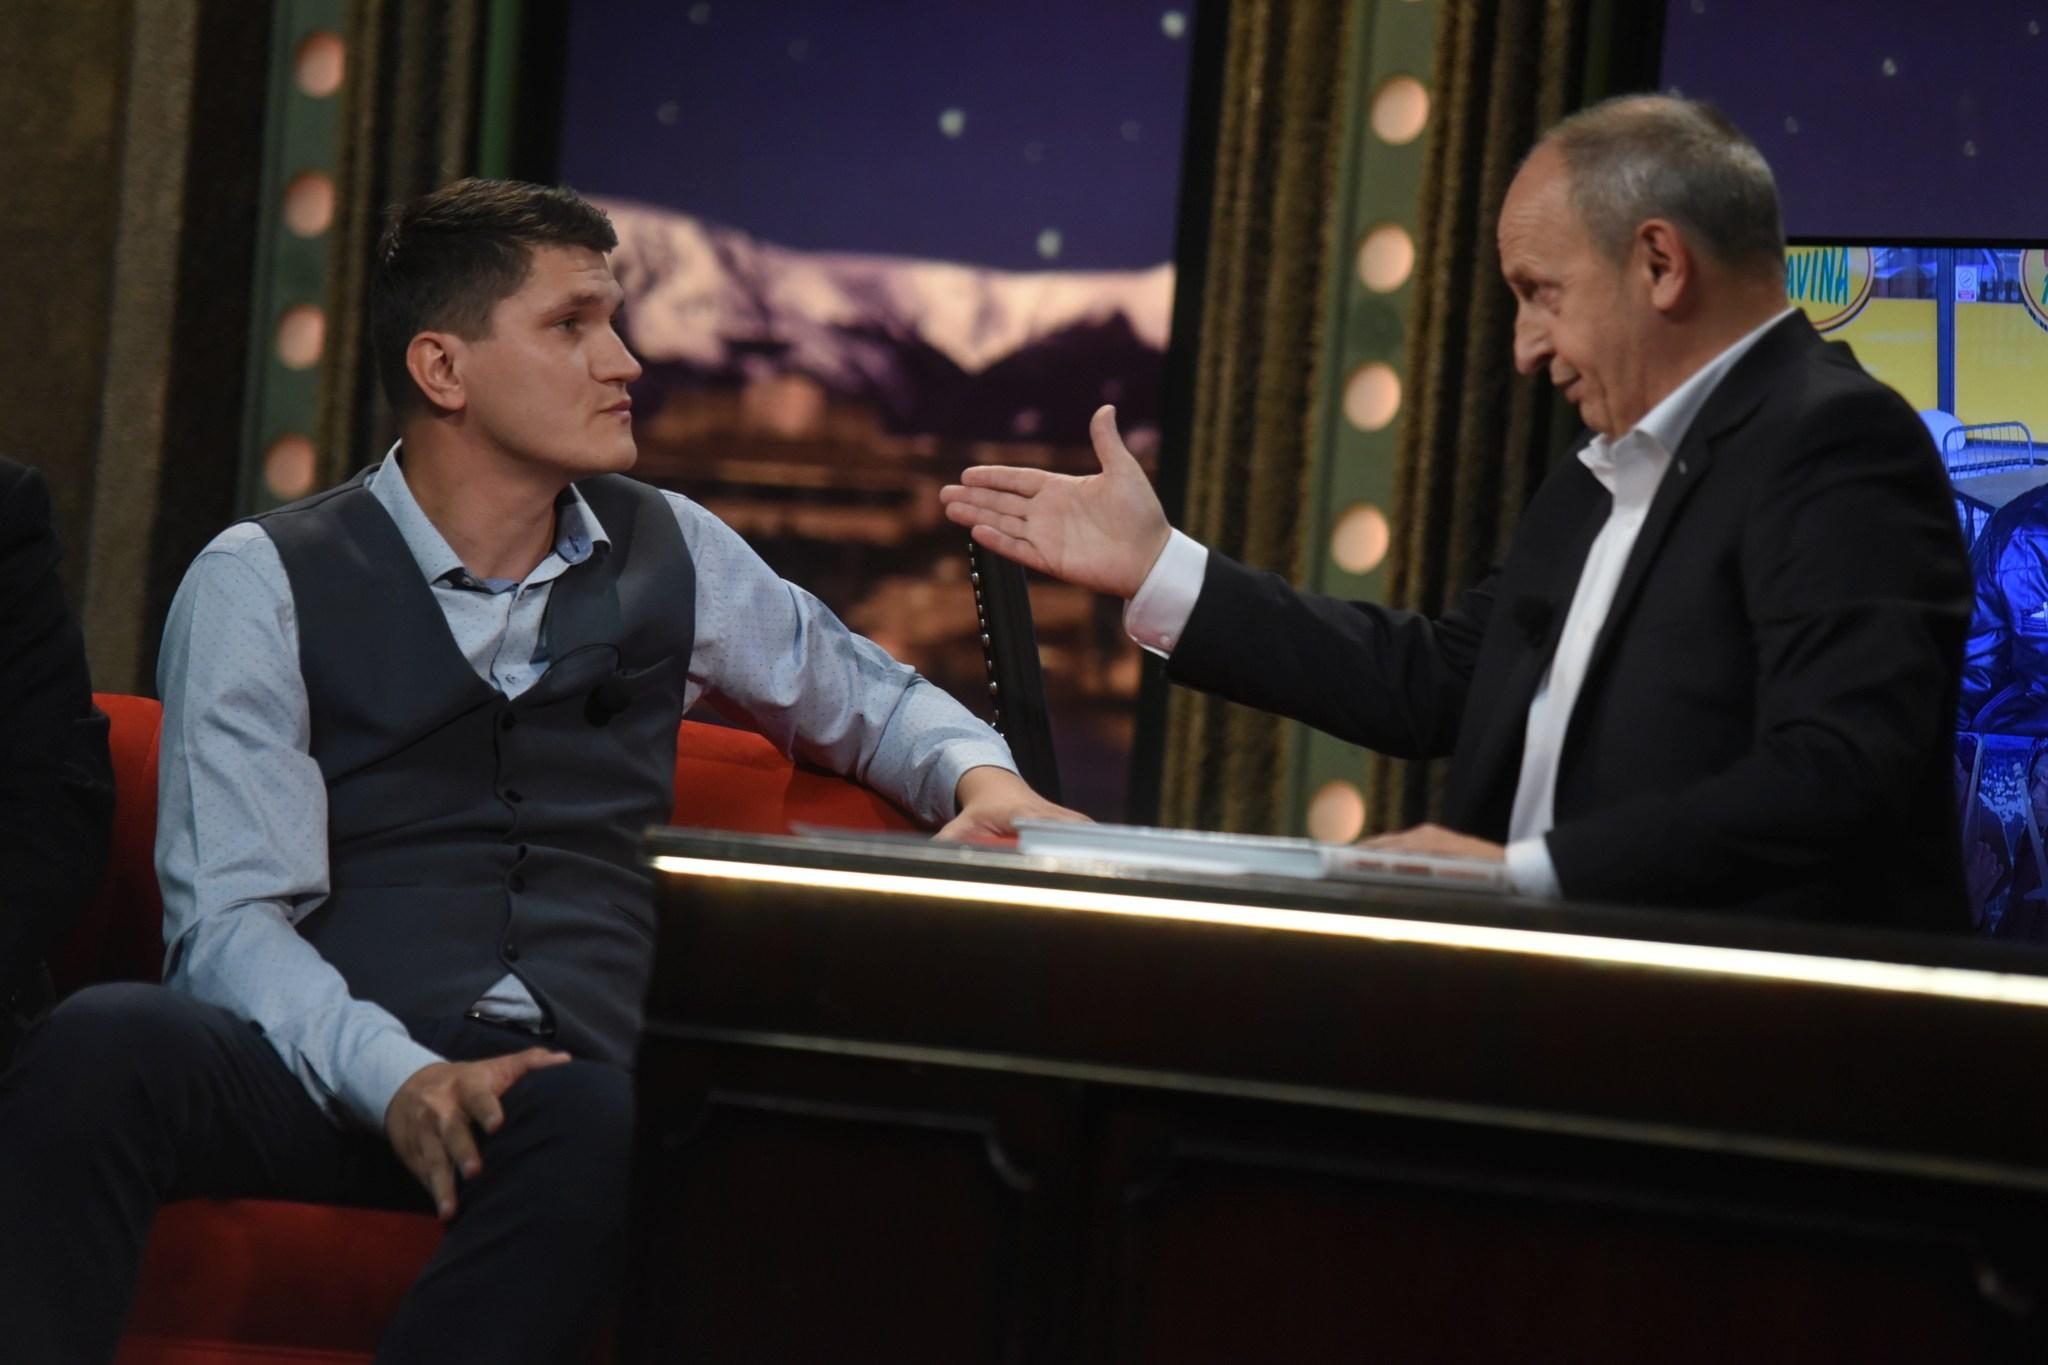 Bohemista a mezinárodně uznávaný vinnetoulog Jaroslav Maryška v SJK 18. 9. 2019